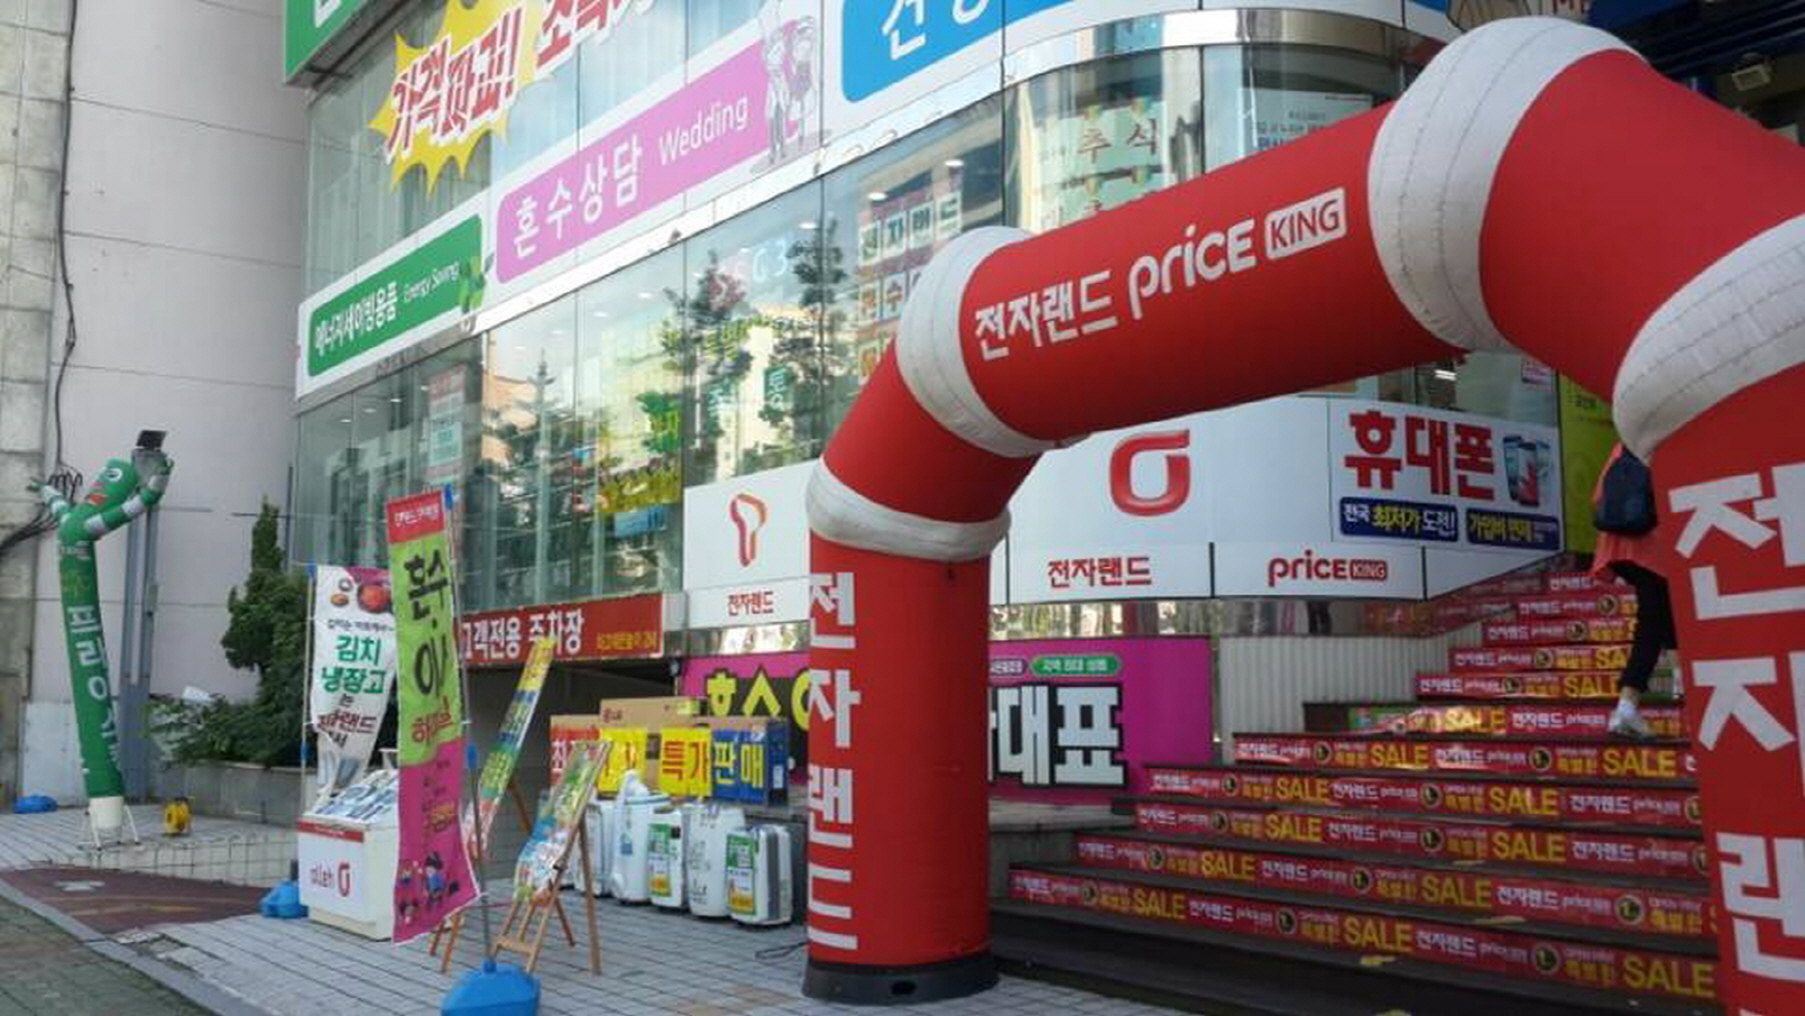 ET Land Price King – Busan Main Branch (전자랜드 프라이스킹 (부산본점))